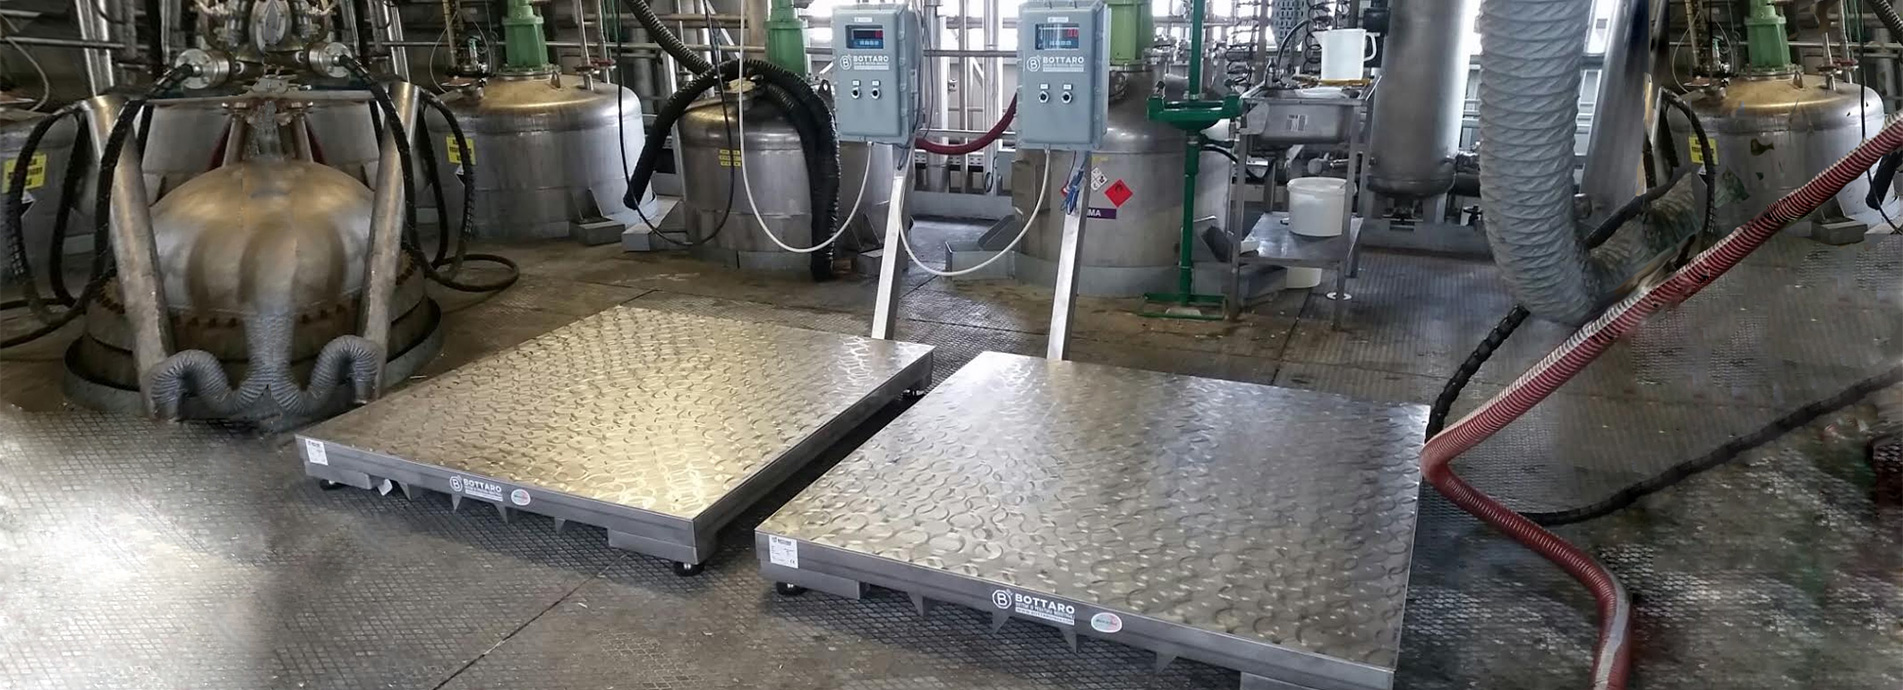 piattaforma-di-pesatura